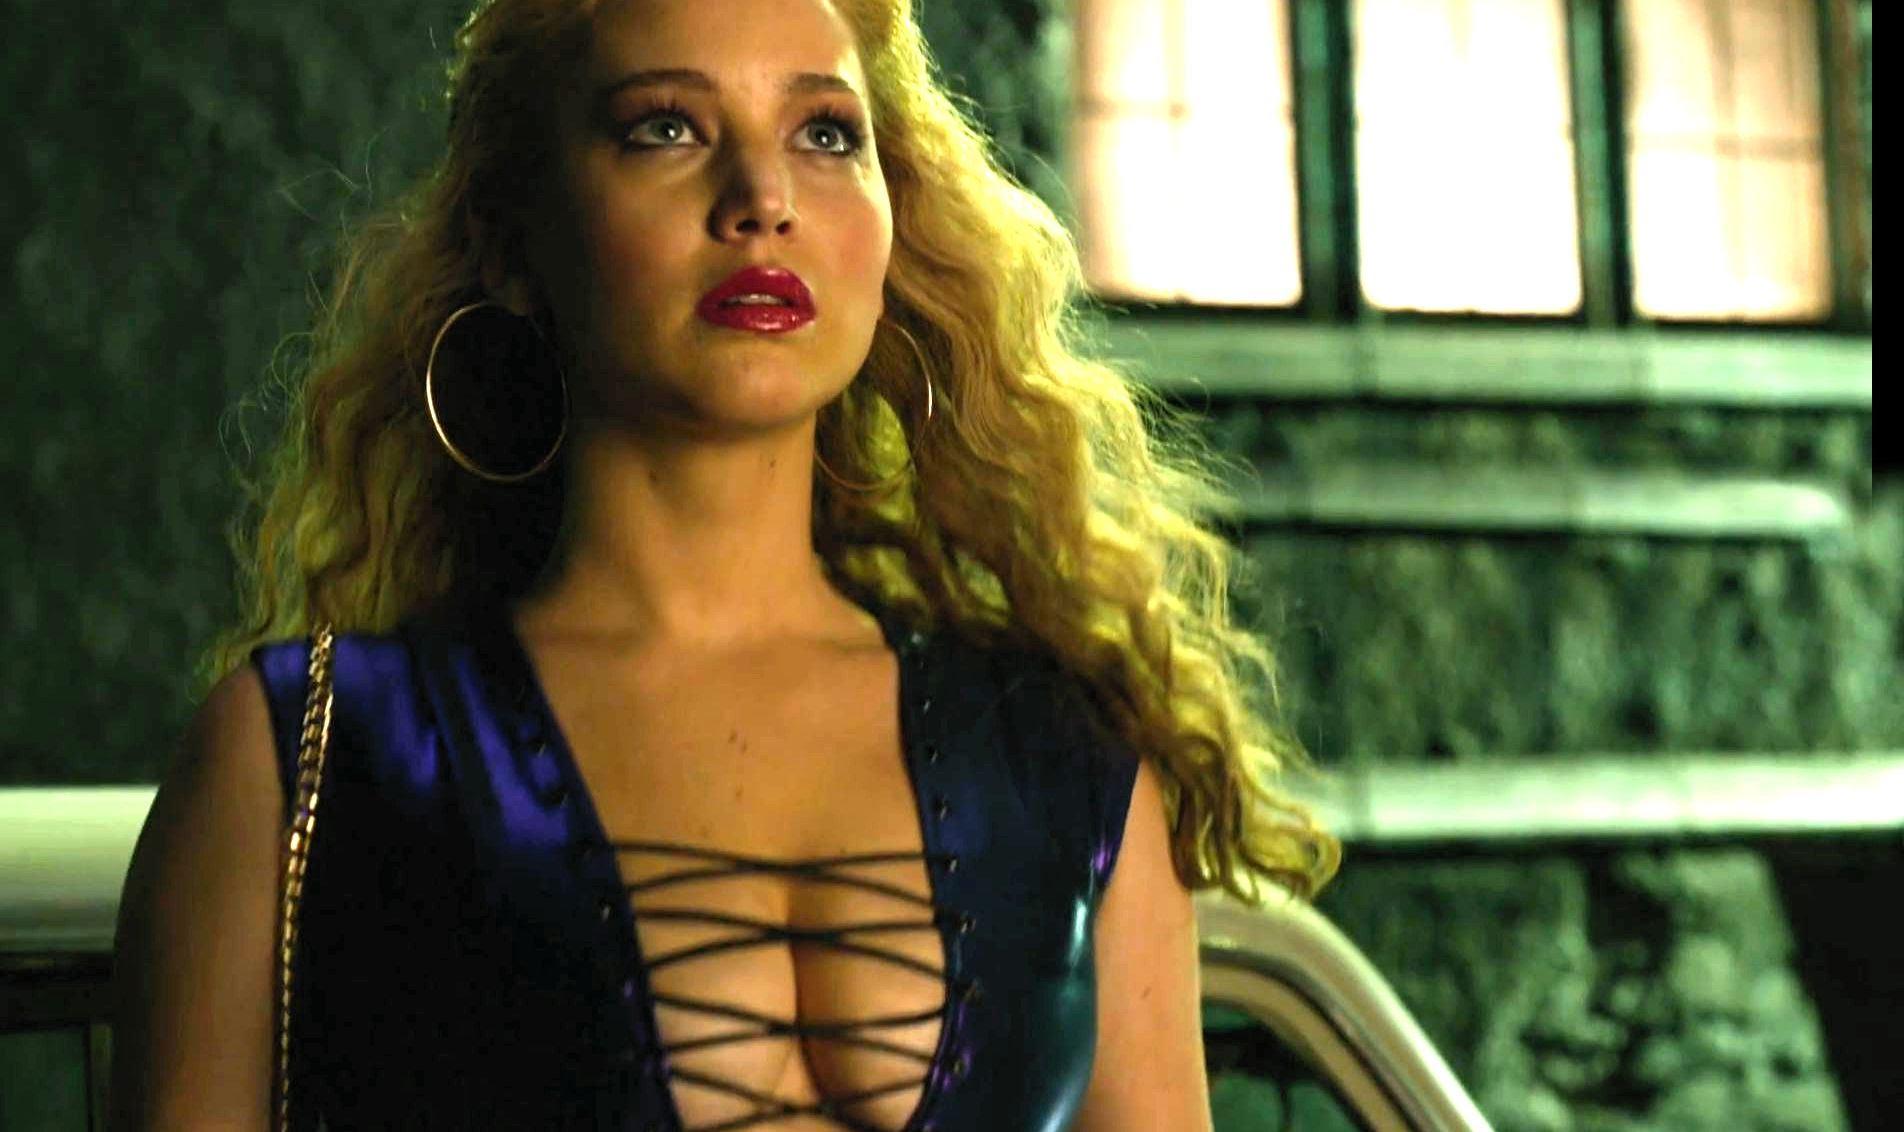 X-Men Star Jennifer Lawrence Brings Smiles At Norton